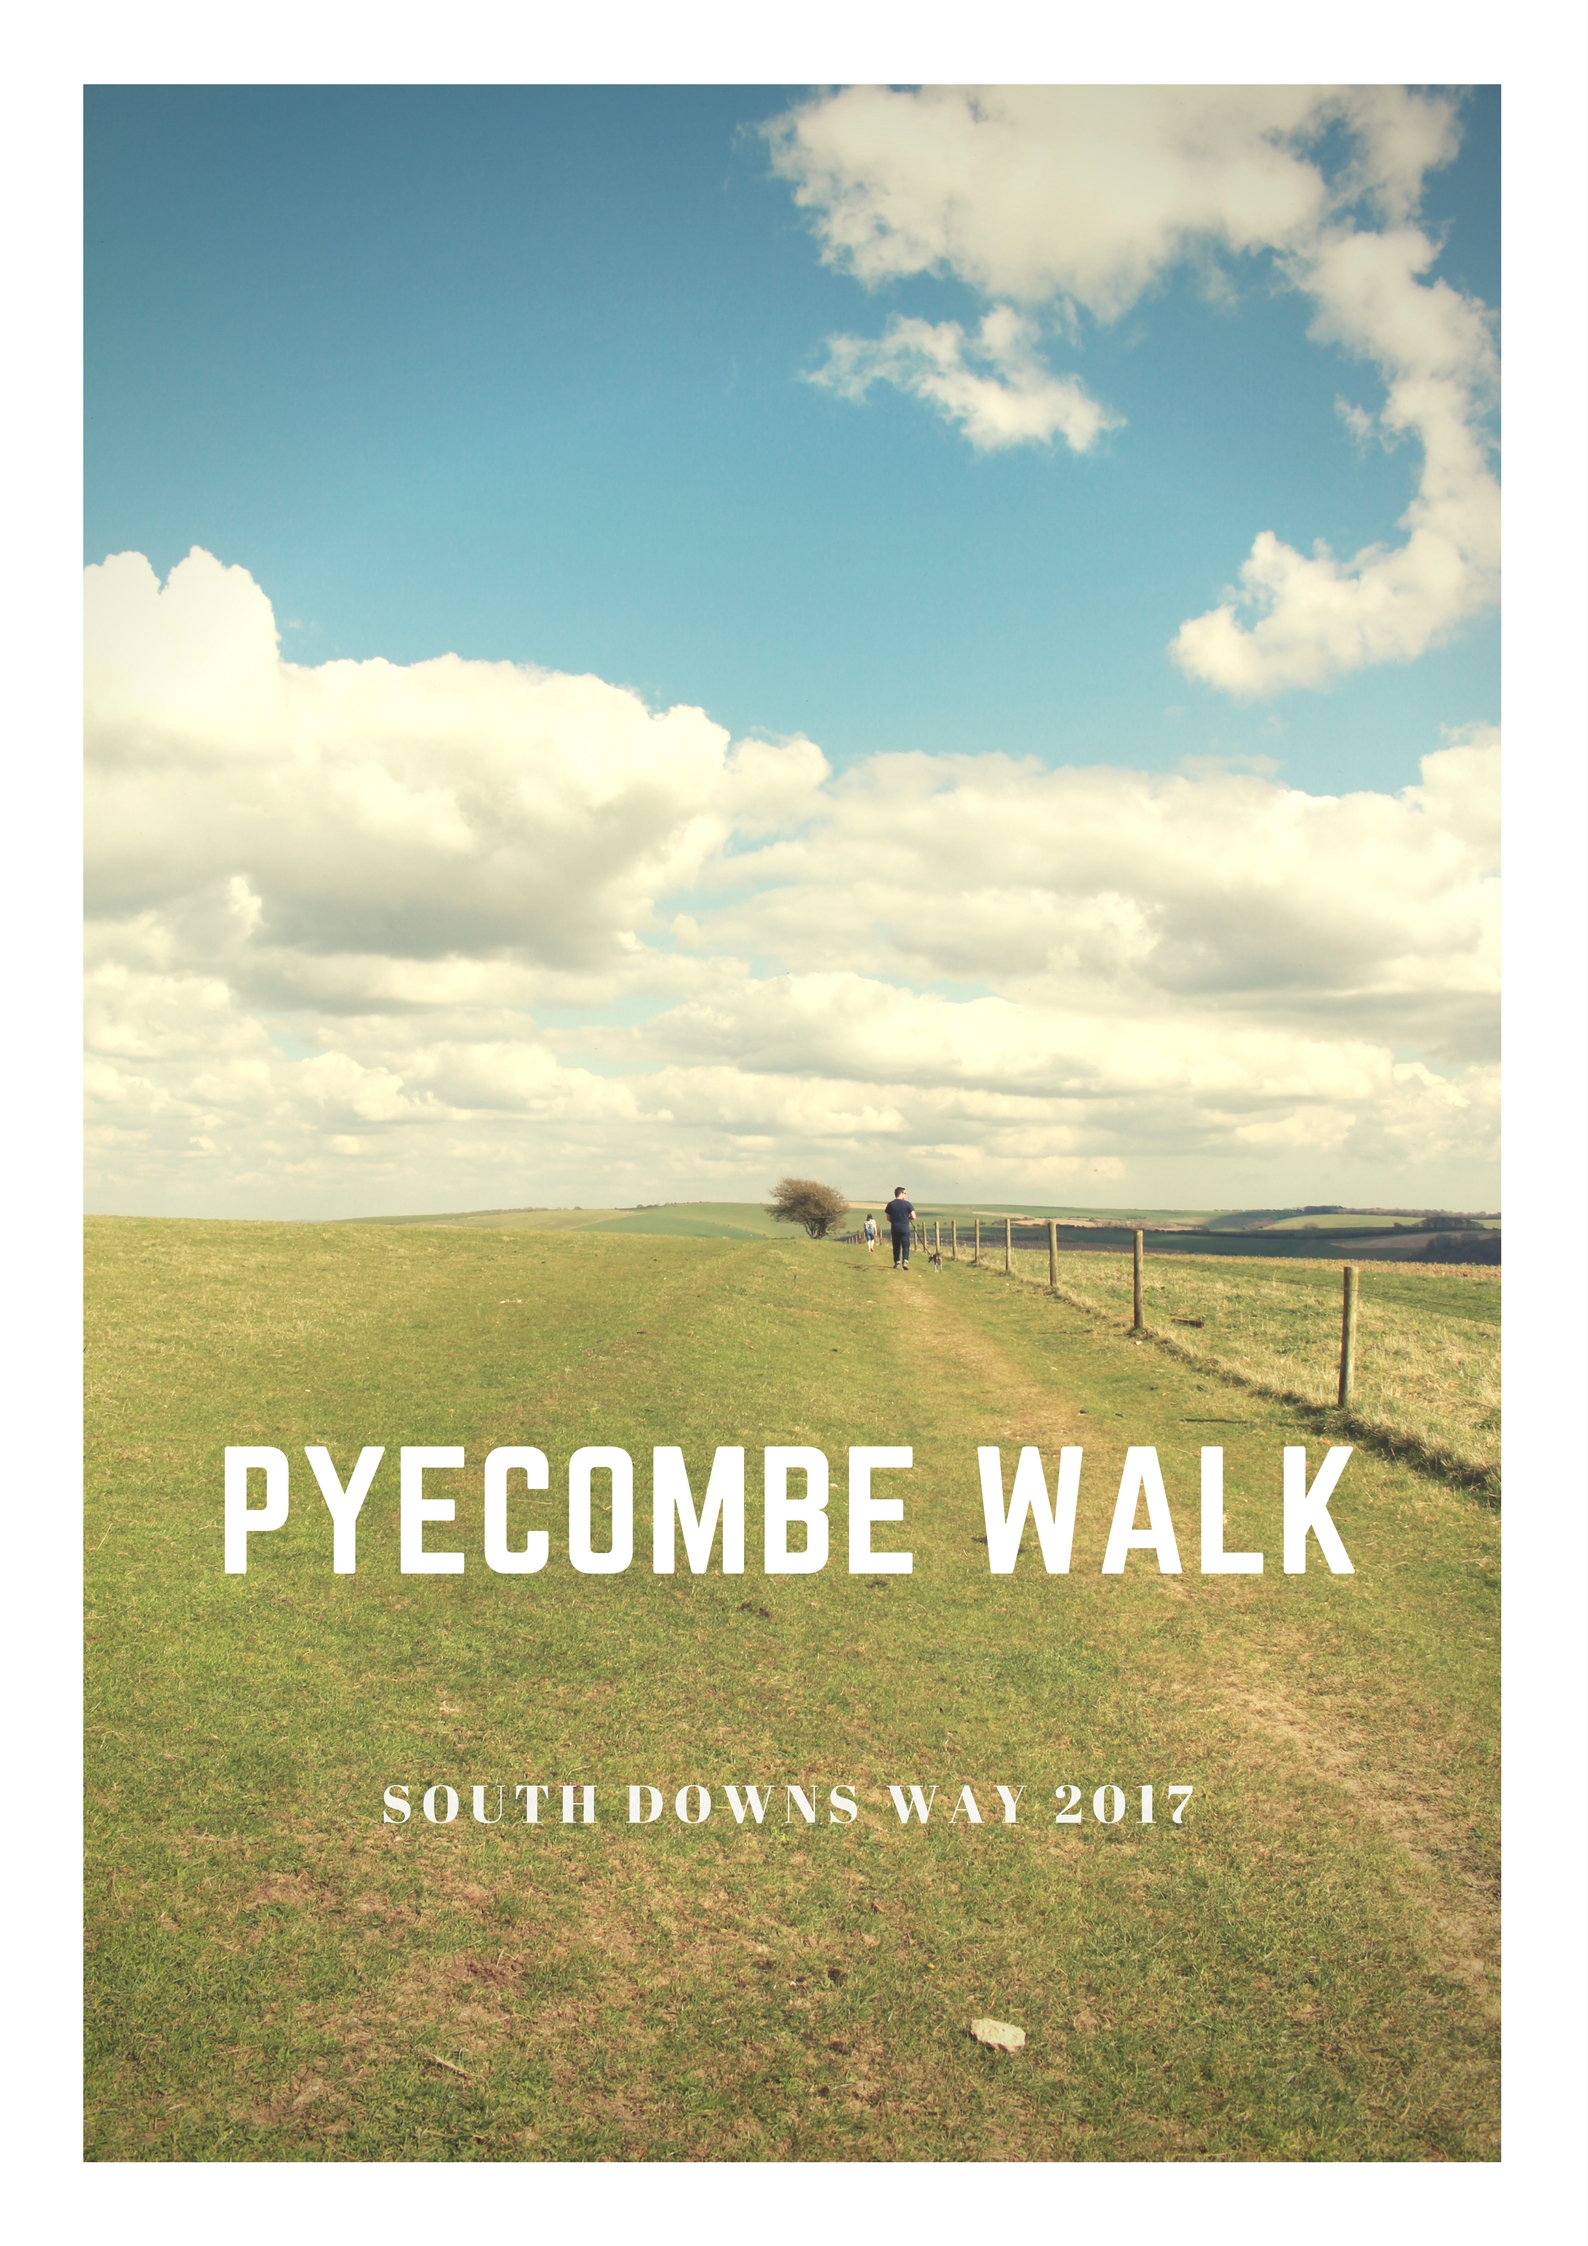 pycombewalk